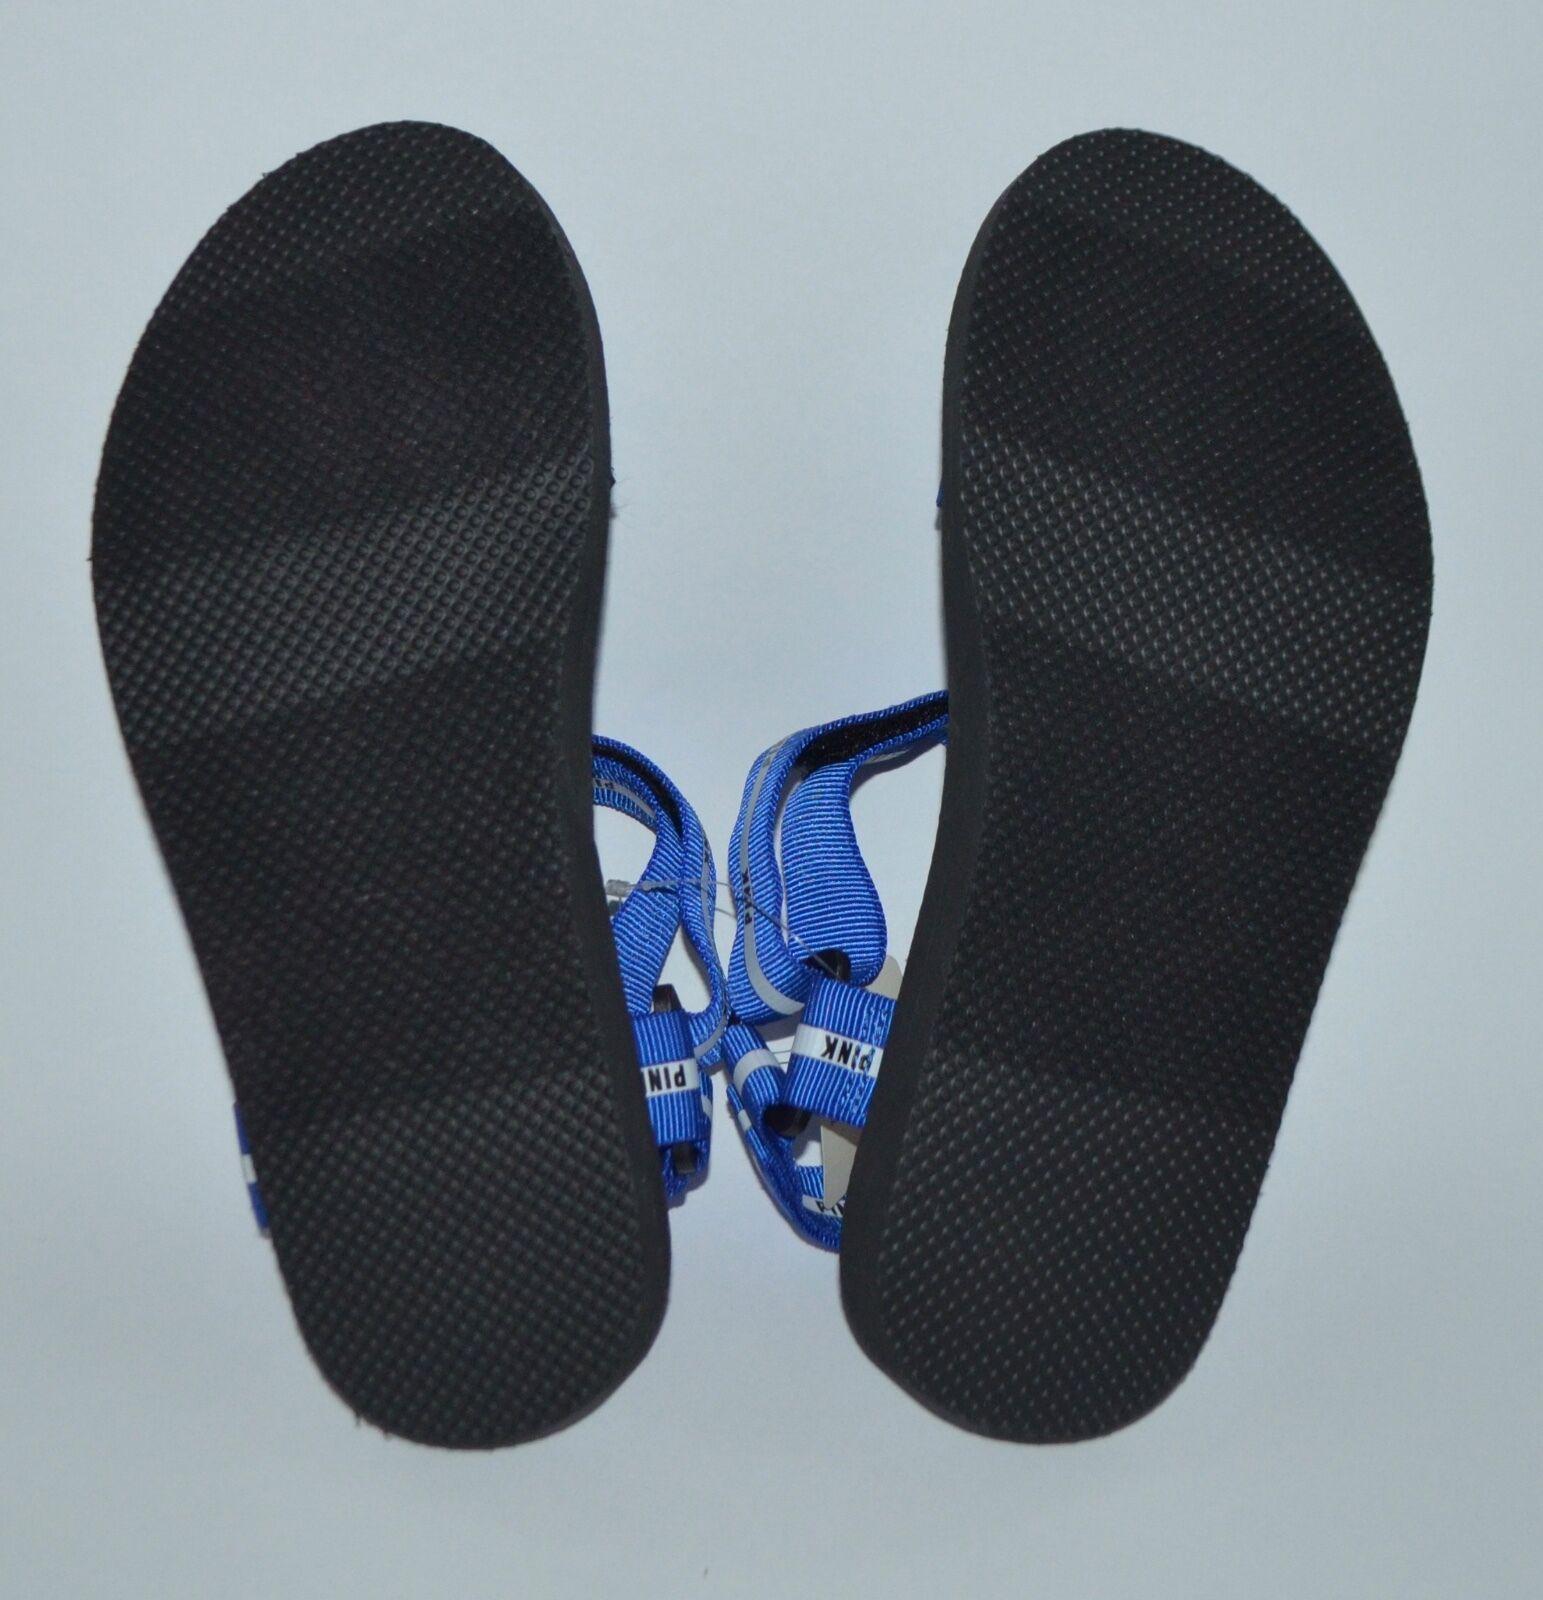 8f182077d2e0b Victoria's Secret Pink Velcro Sandals Slides NWTS Small 5/6